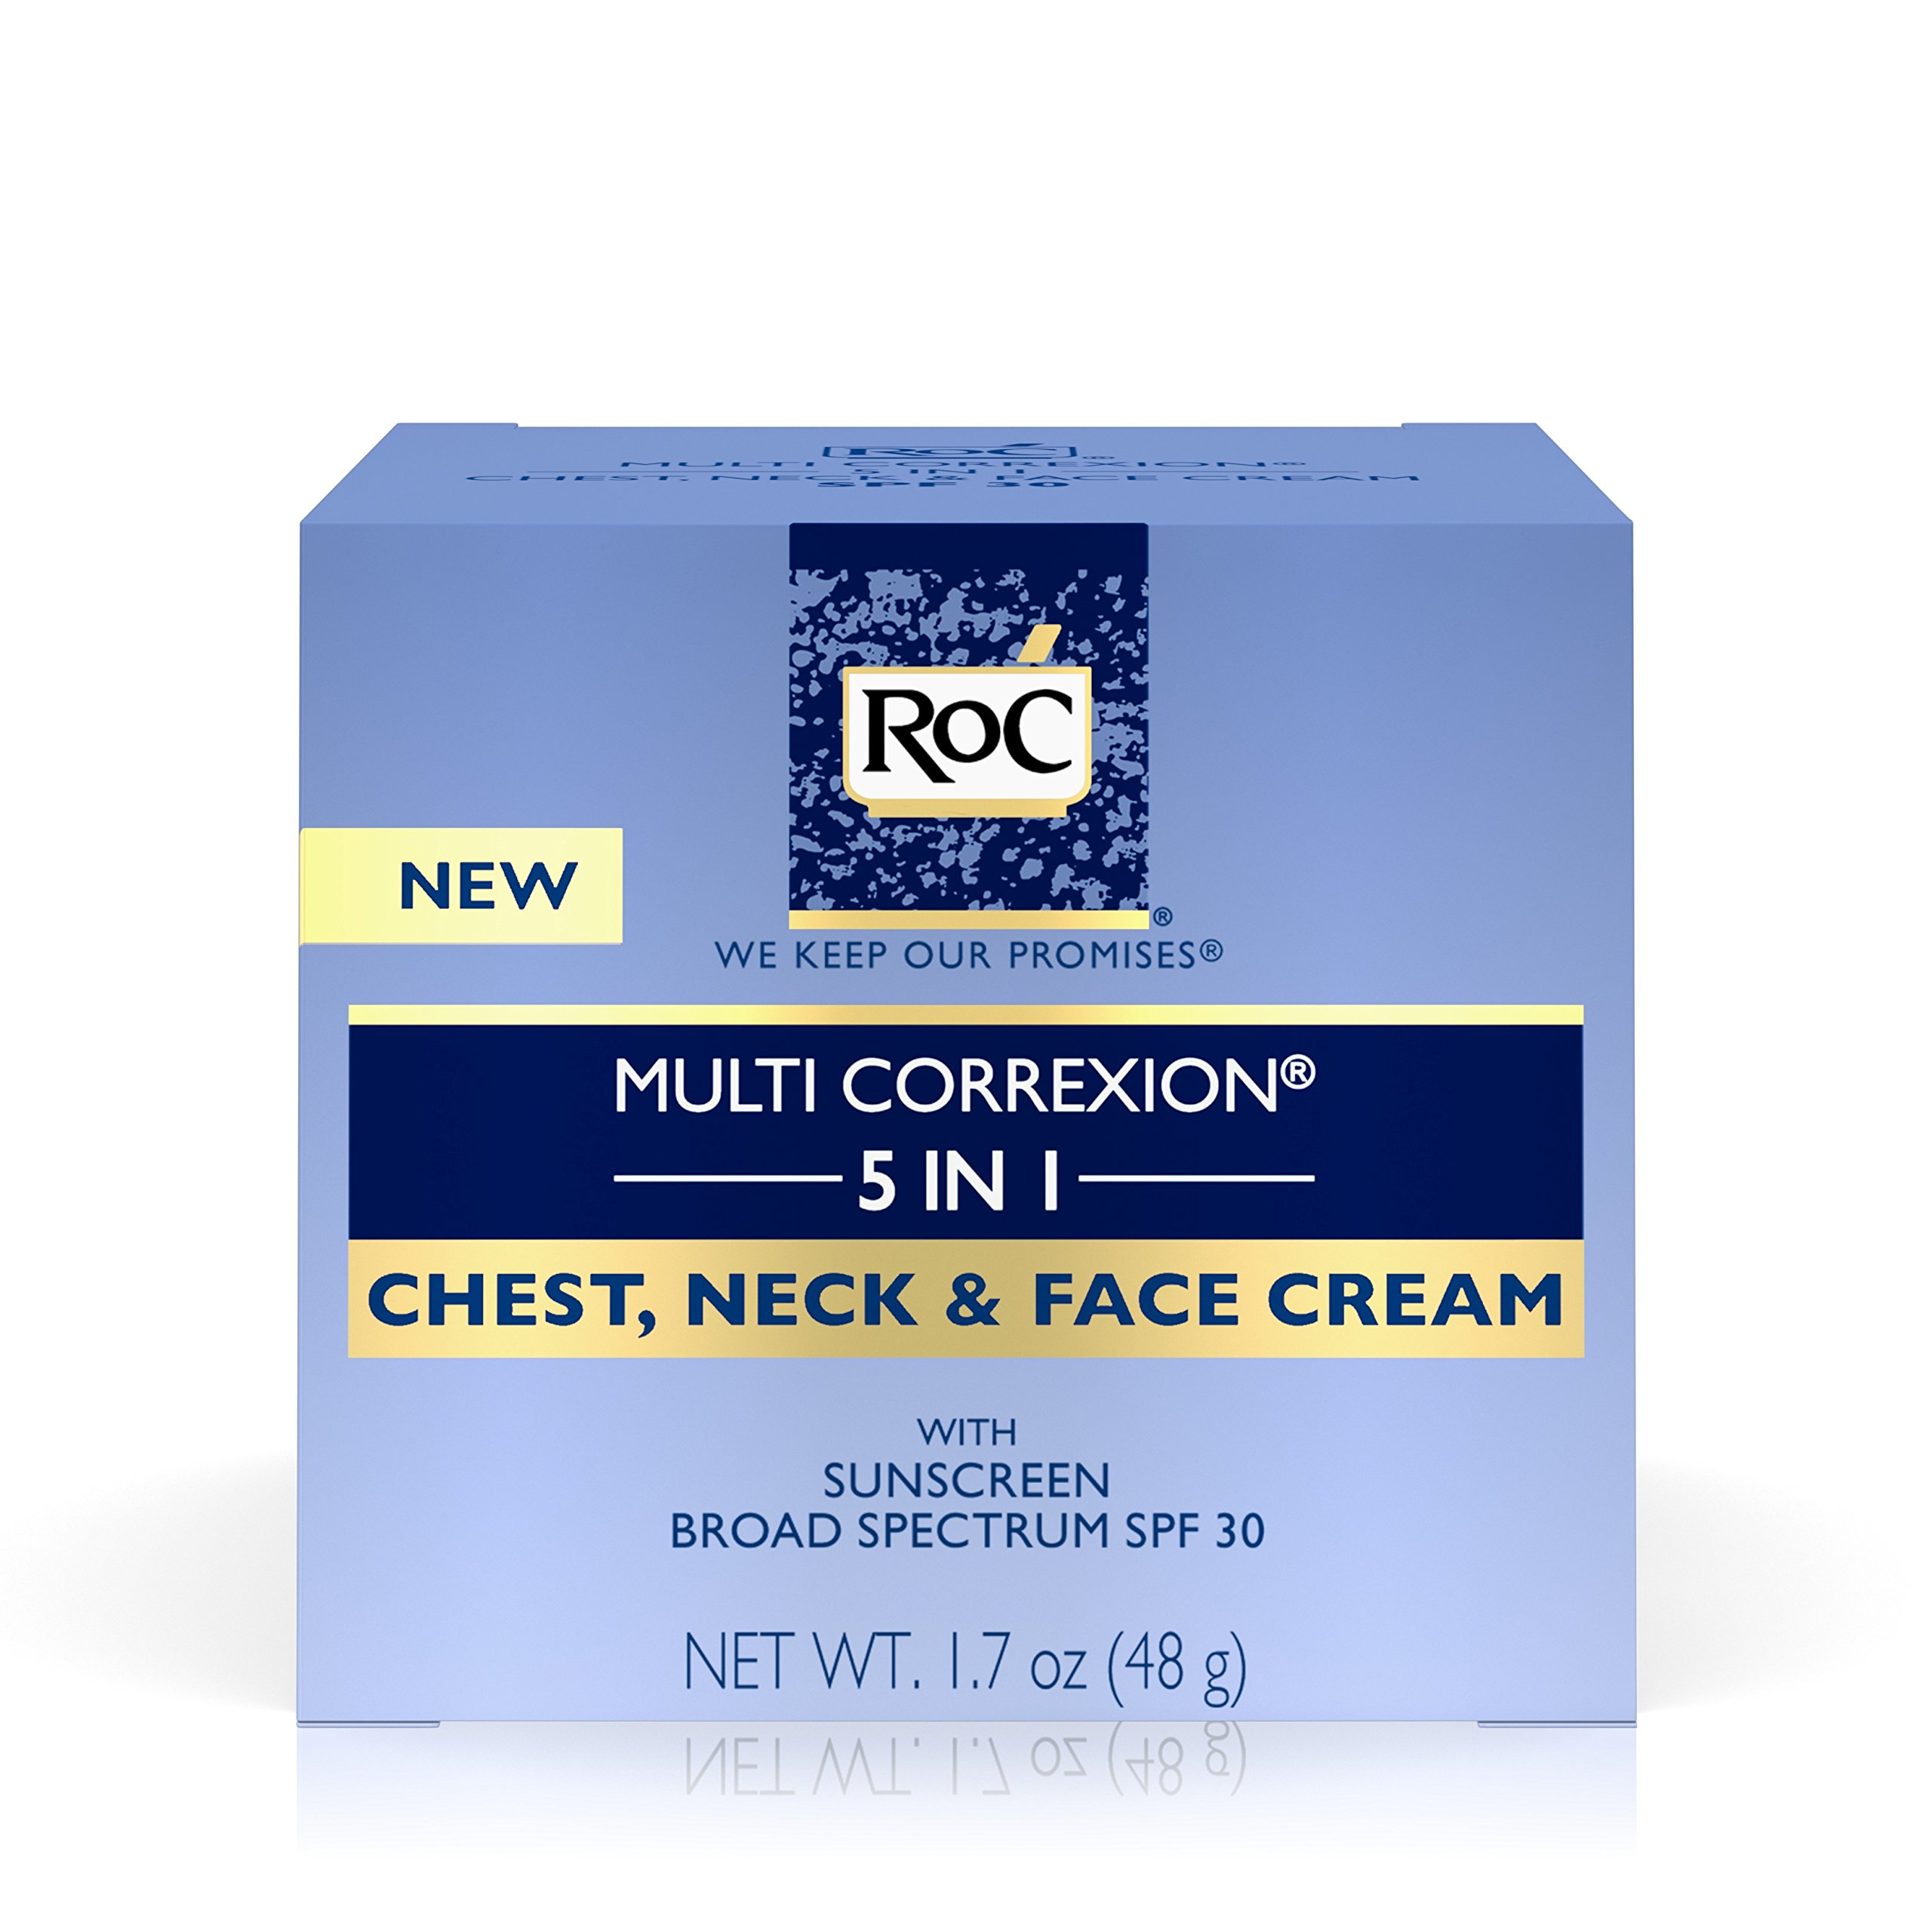 RoC Multi Correxion 5 in 1 Anti-Aging Chest, Neck and Face Cream with SPF 30, Moisturizing Cream Made with Vitamin E, 1.7 oz by RoC